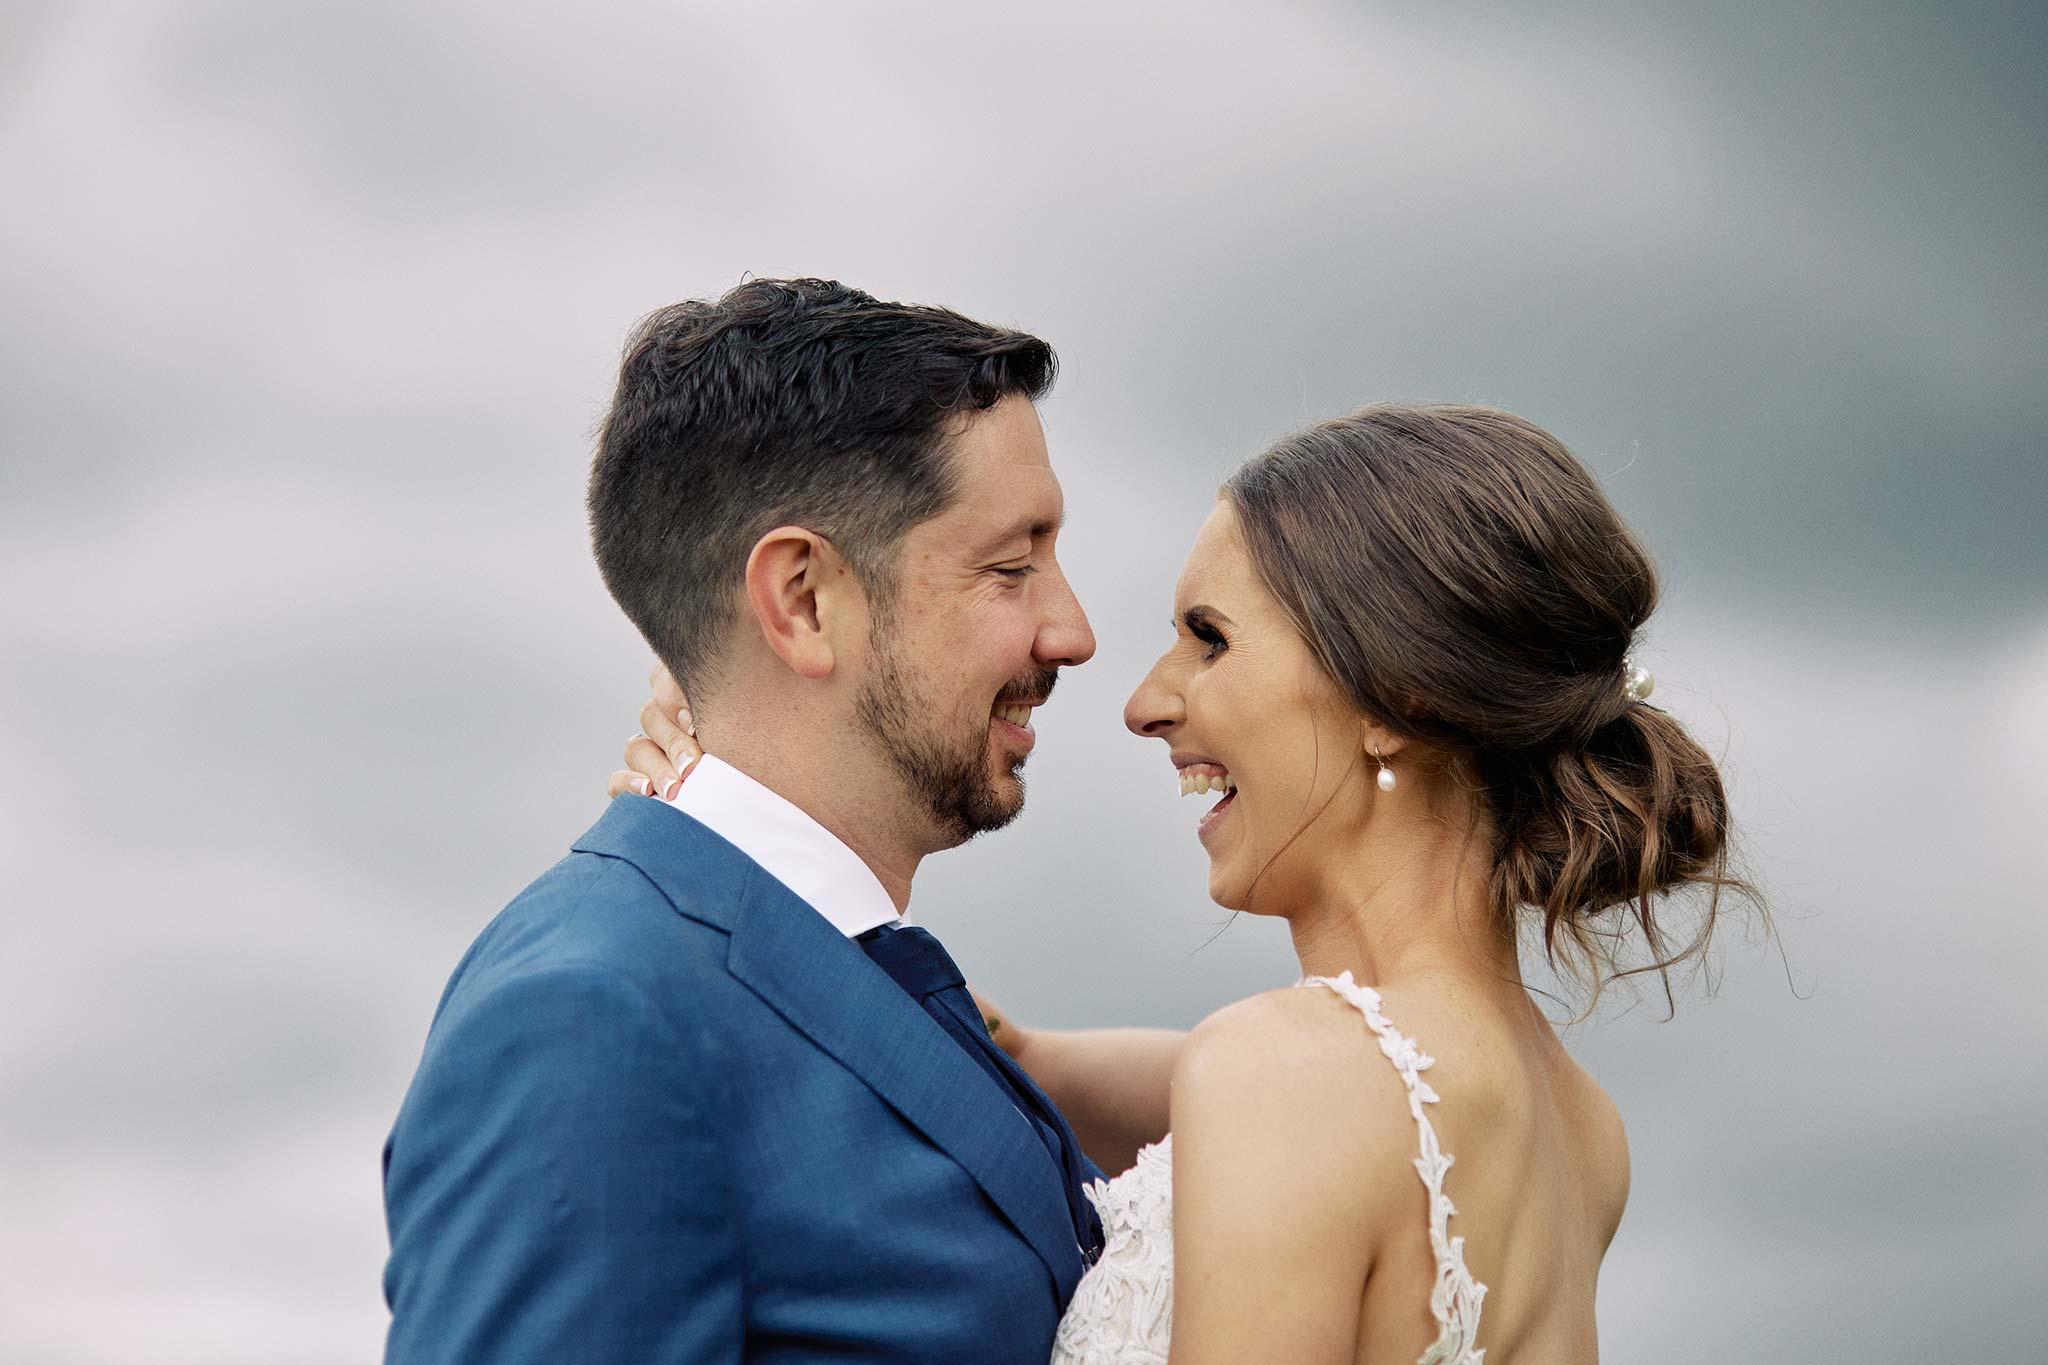 Zonzo estate wedding 85mm close up of bride groom